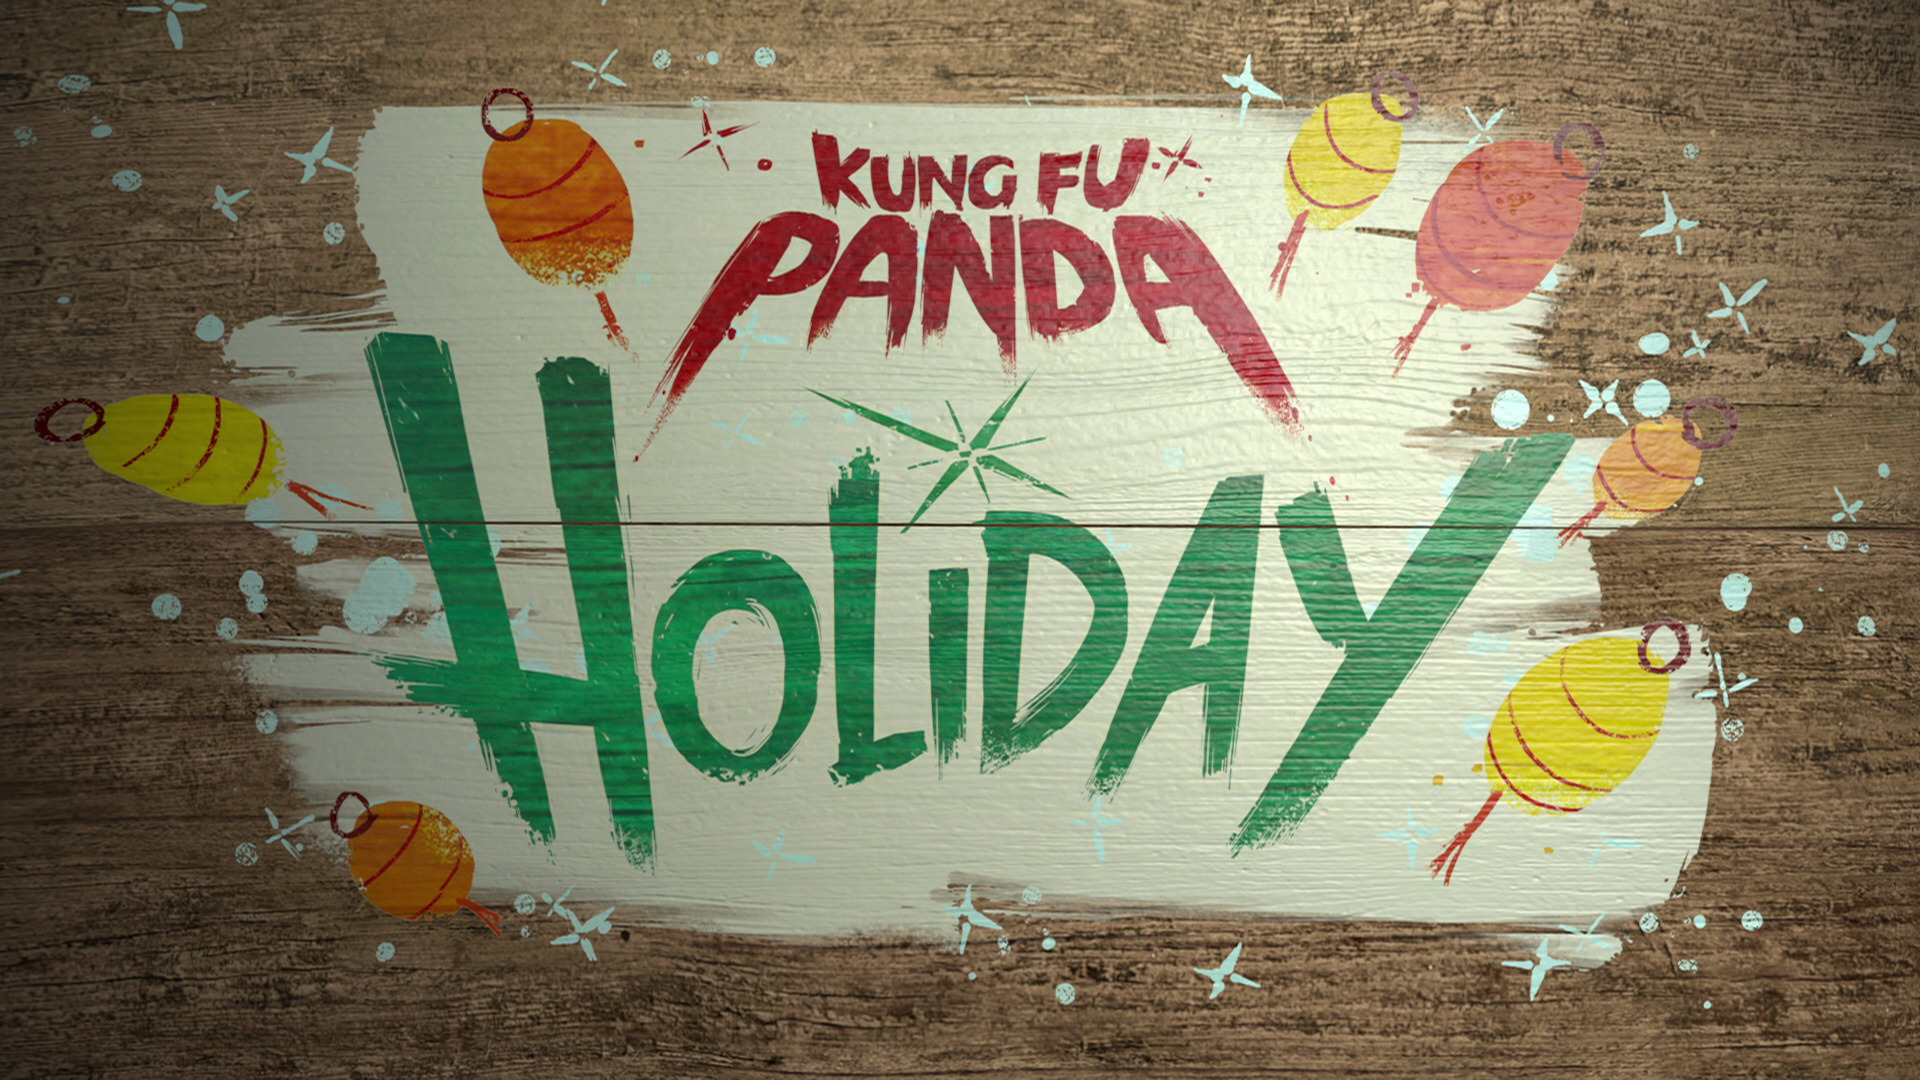 Kung Fu Panda Holiday/Transcript   Kung Fu Panda Wiki   FANDOM ...